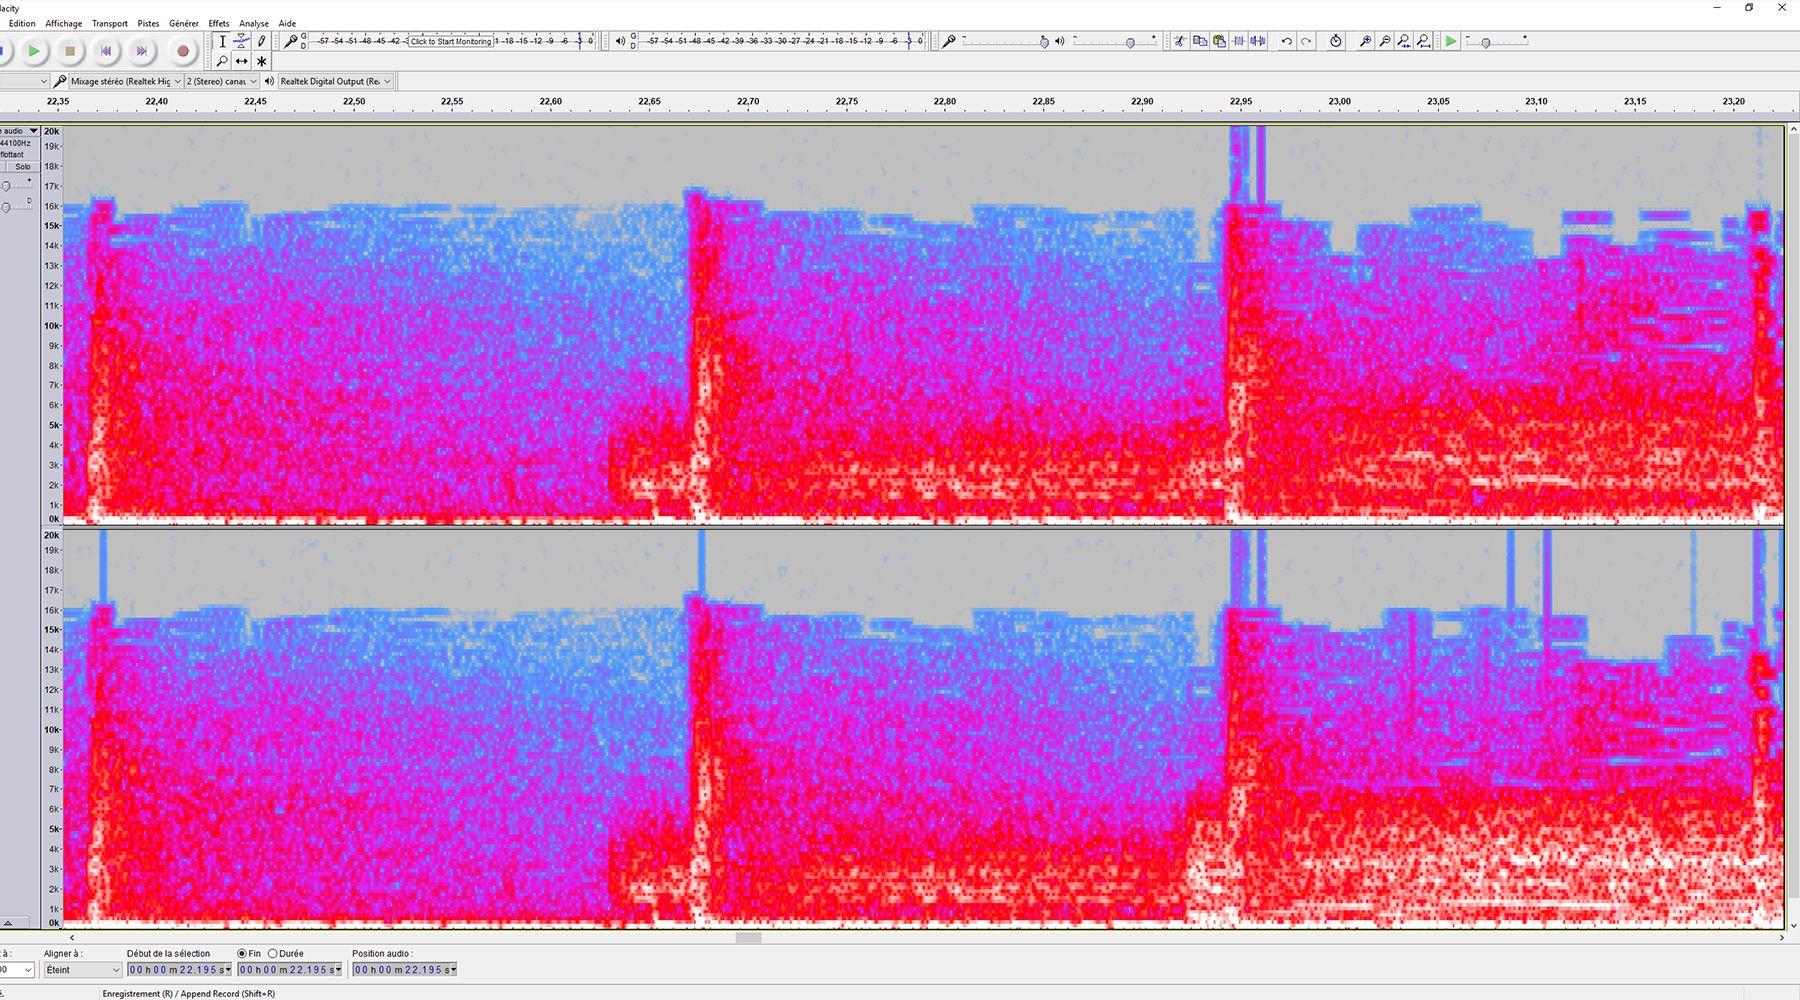 AudioSoundcloudGo2SG